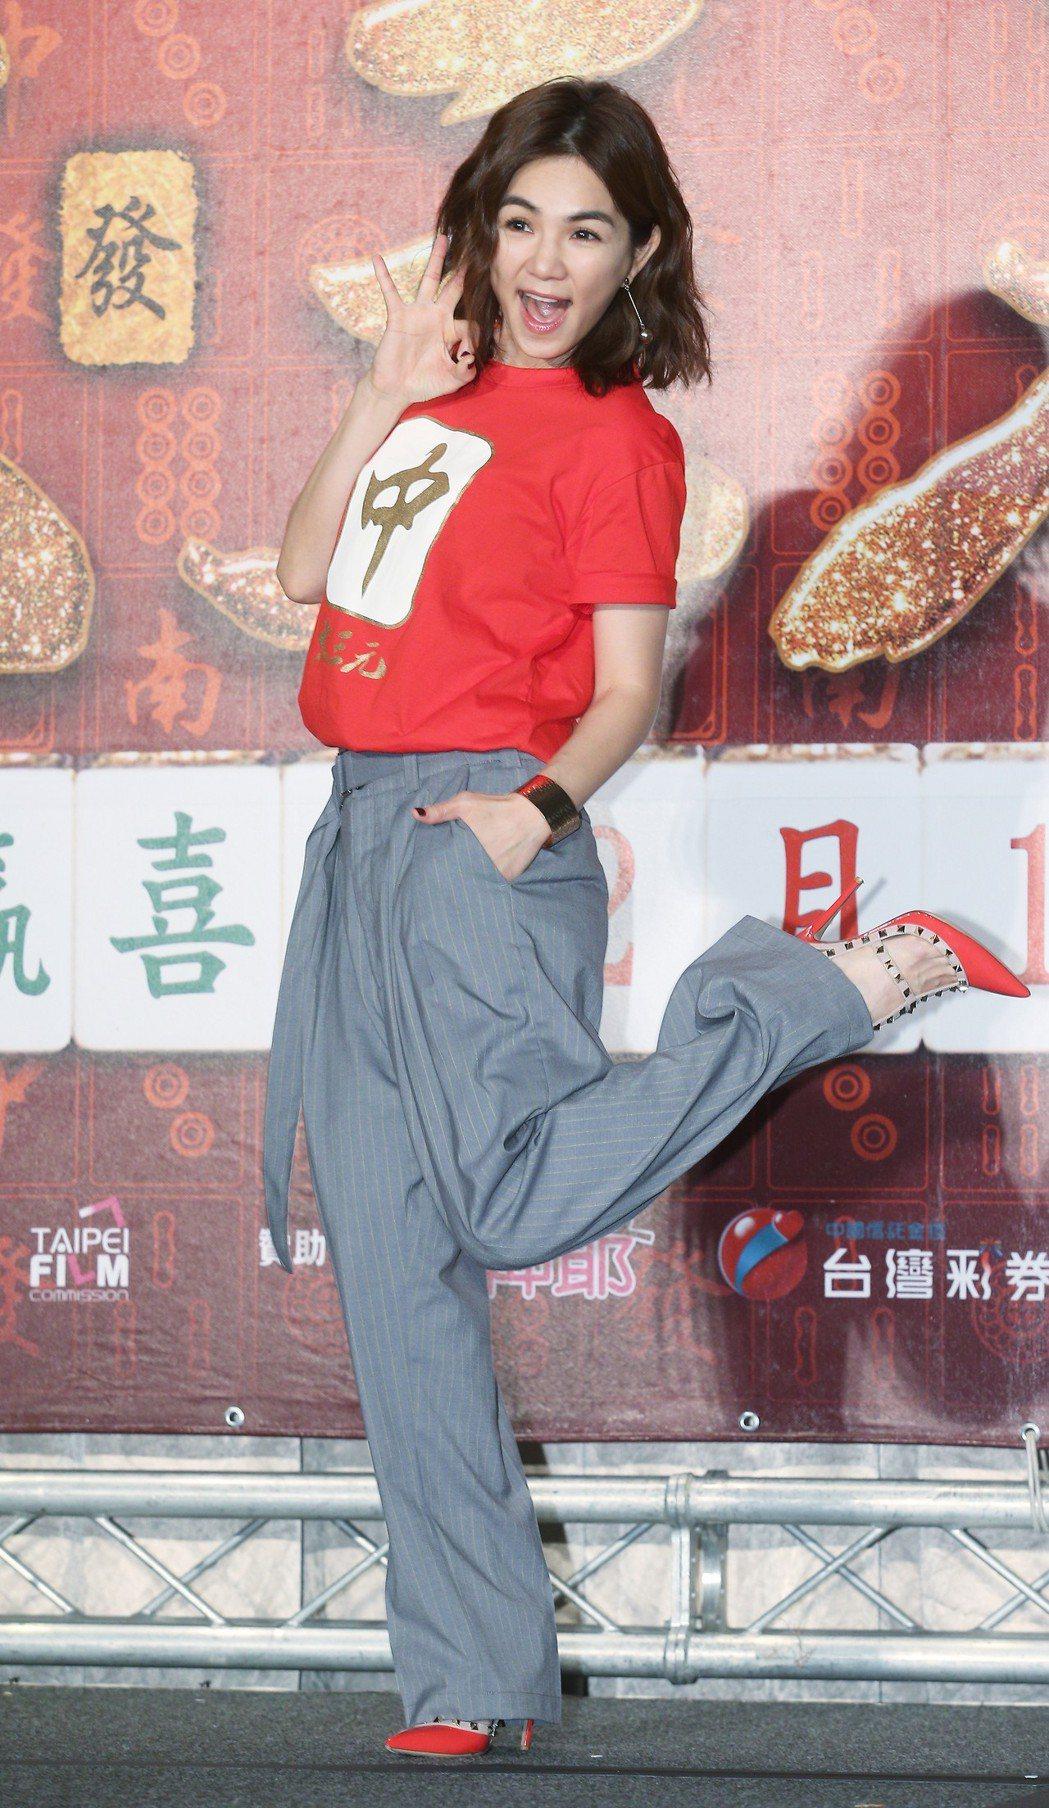 Ella演出賀歲片「大三元」。記者陳正興/攝影